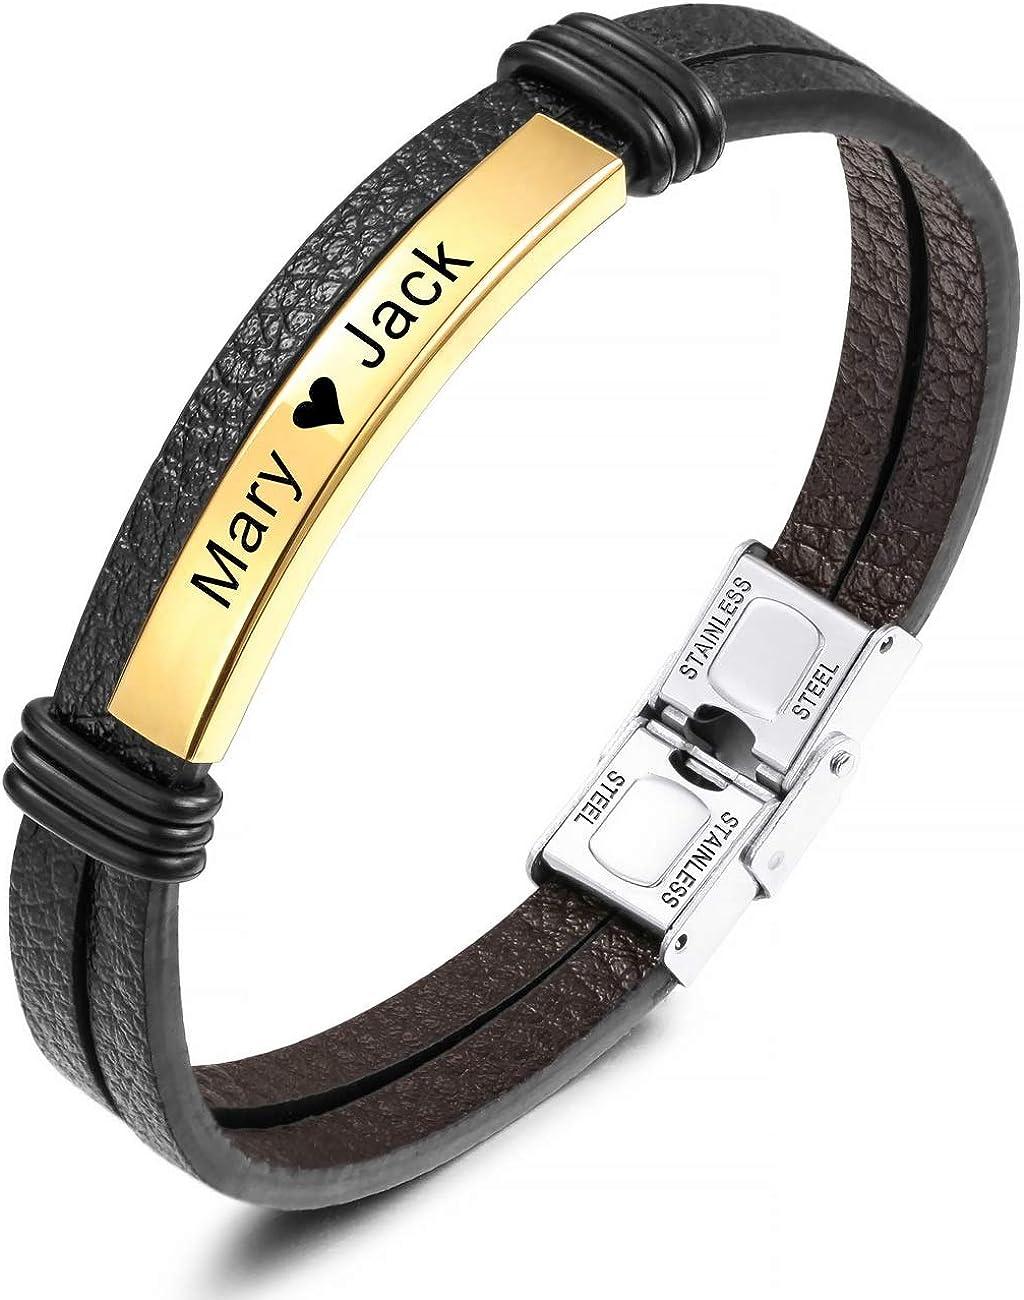 MeMeDIY Name Bracelet Personalized Bracelets for Women Customized Bracelets for Boys Men Girls Stainless Steel Genuine Leather Engraving Braided Cuff Adjustable